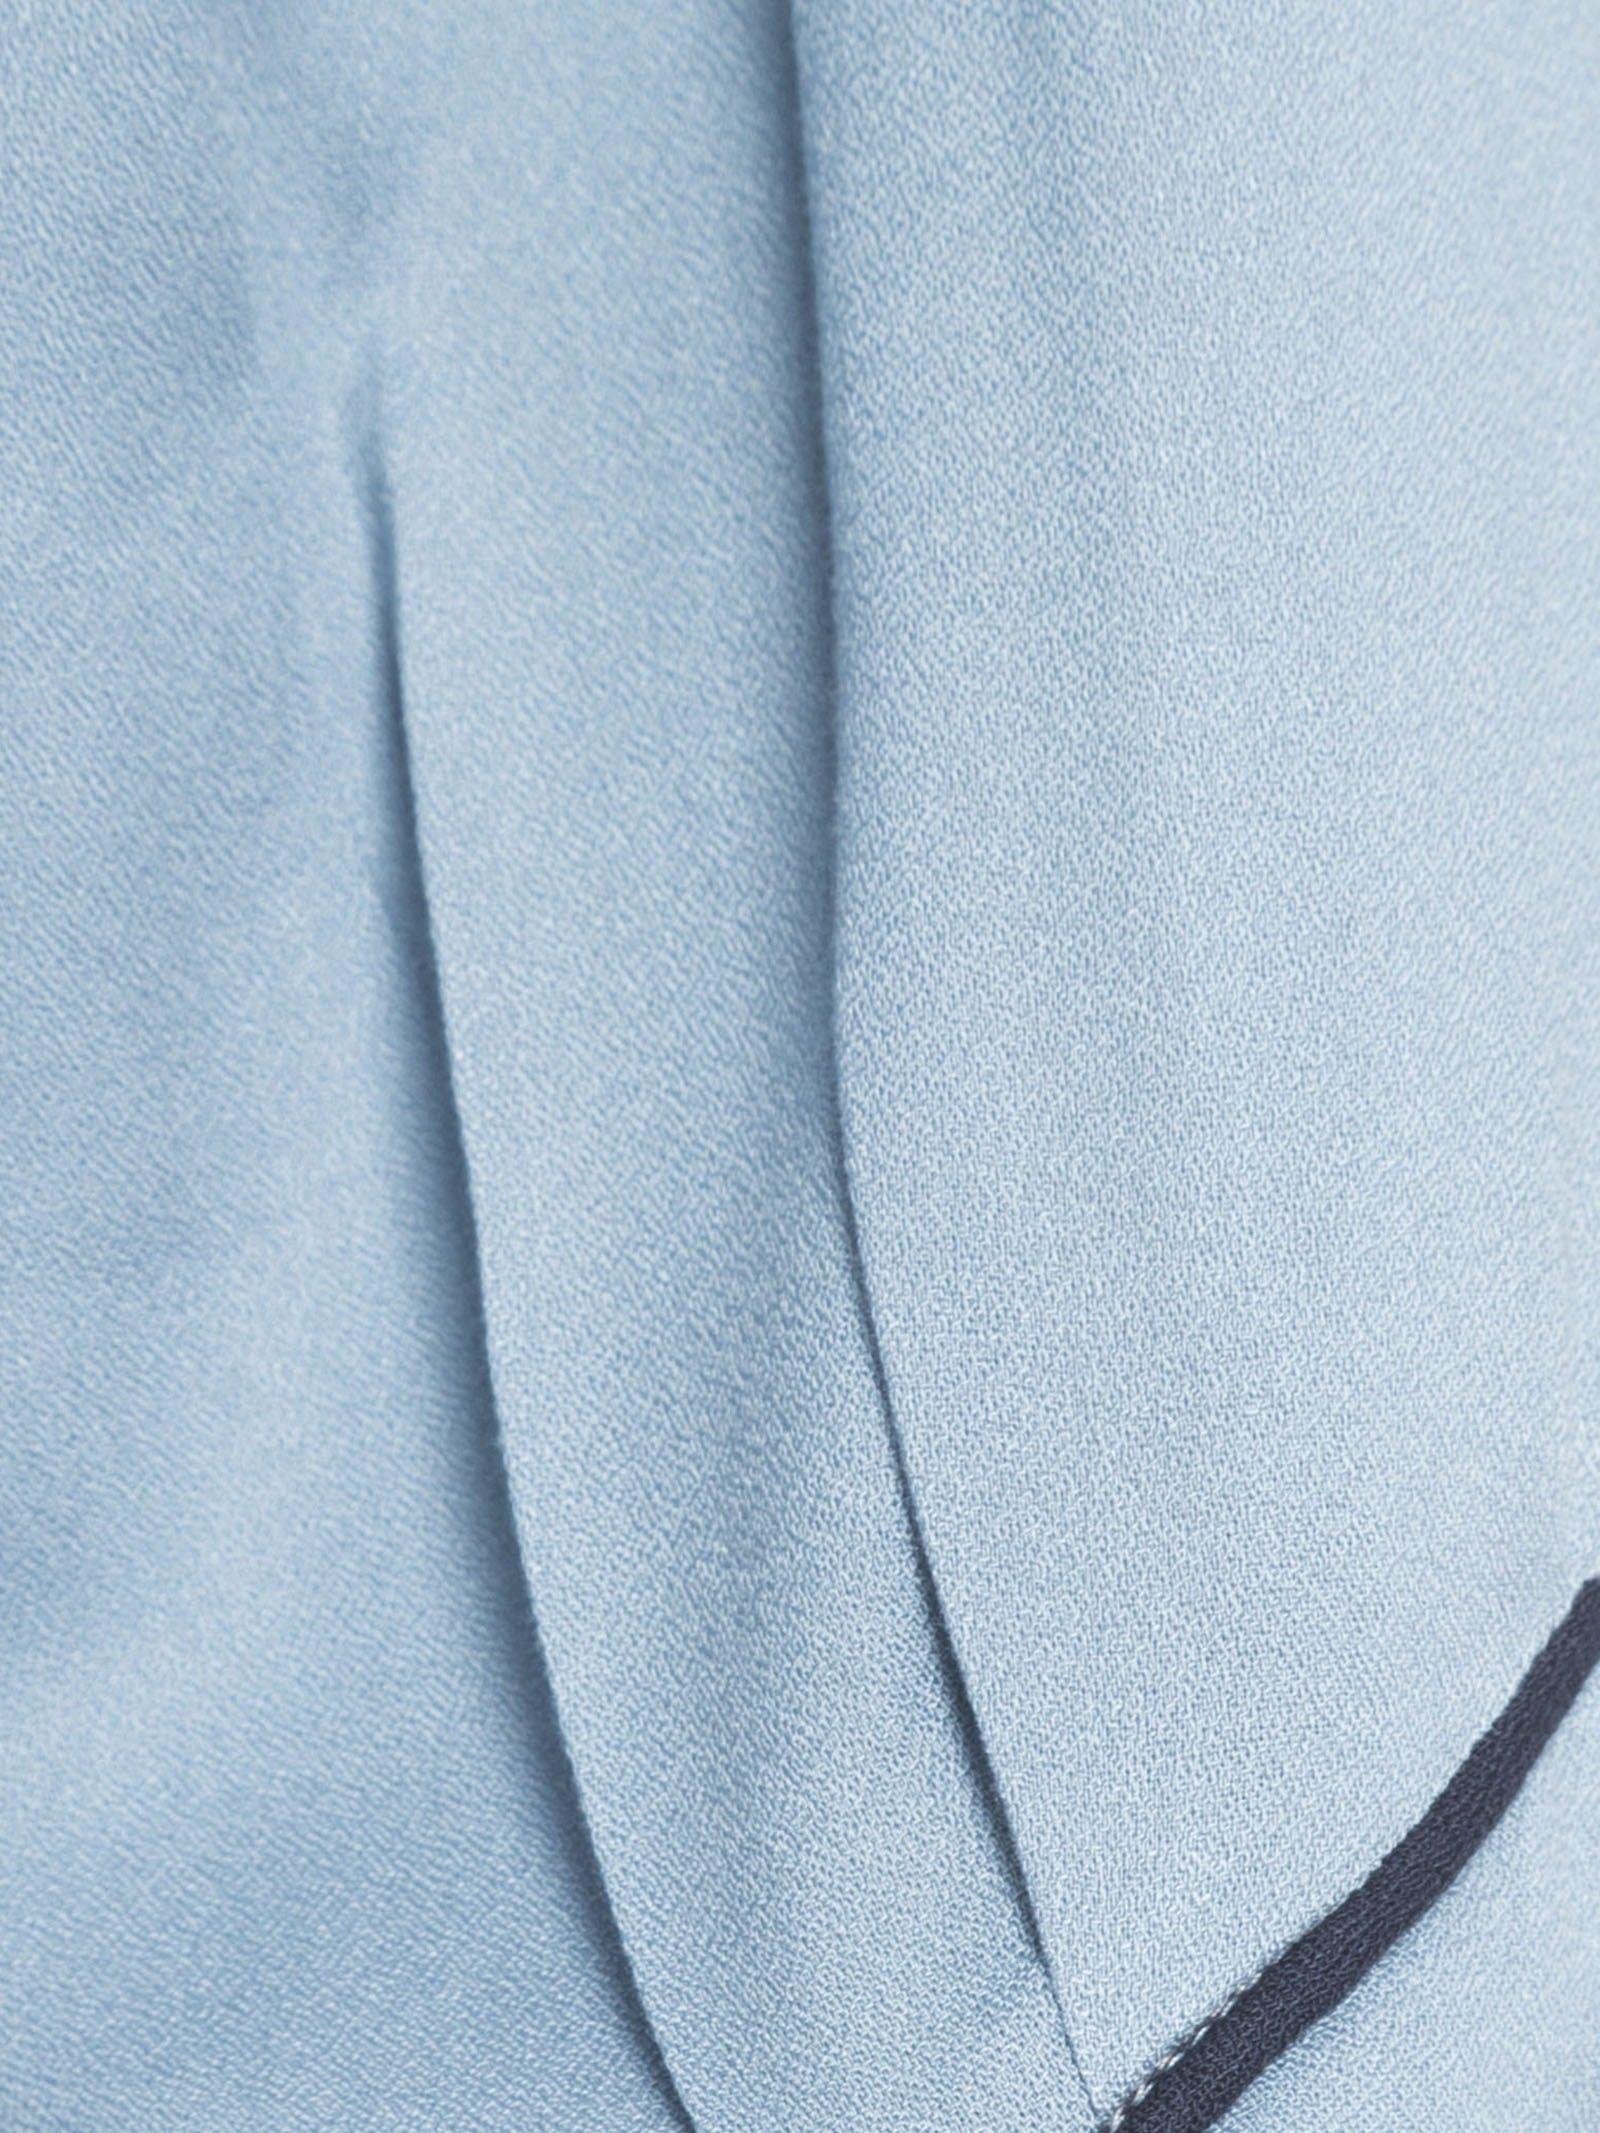 Camisa Feminina - Cris Barros - Azul - Shop2gether